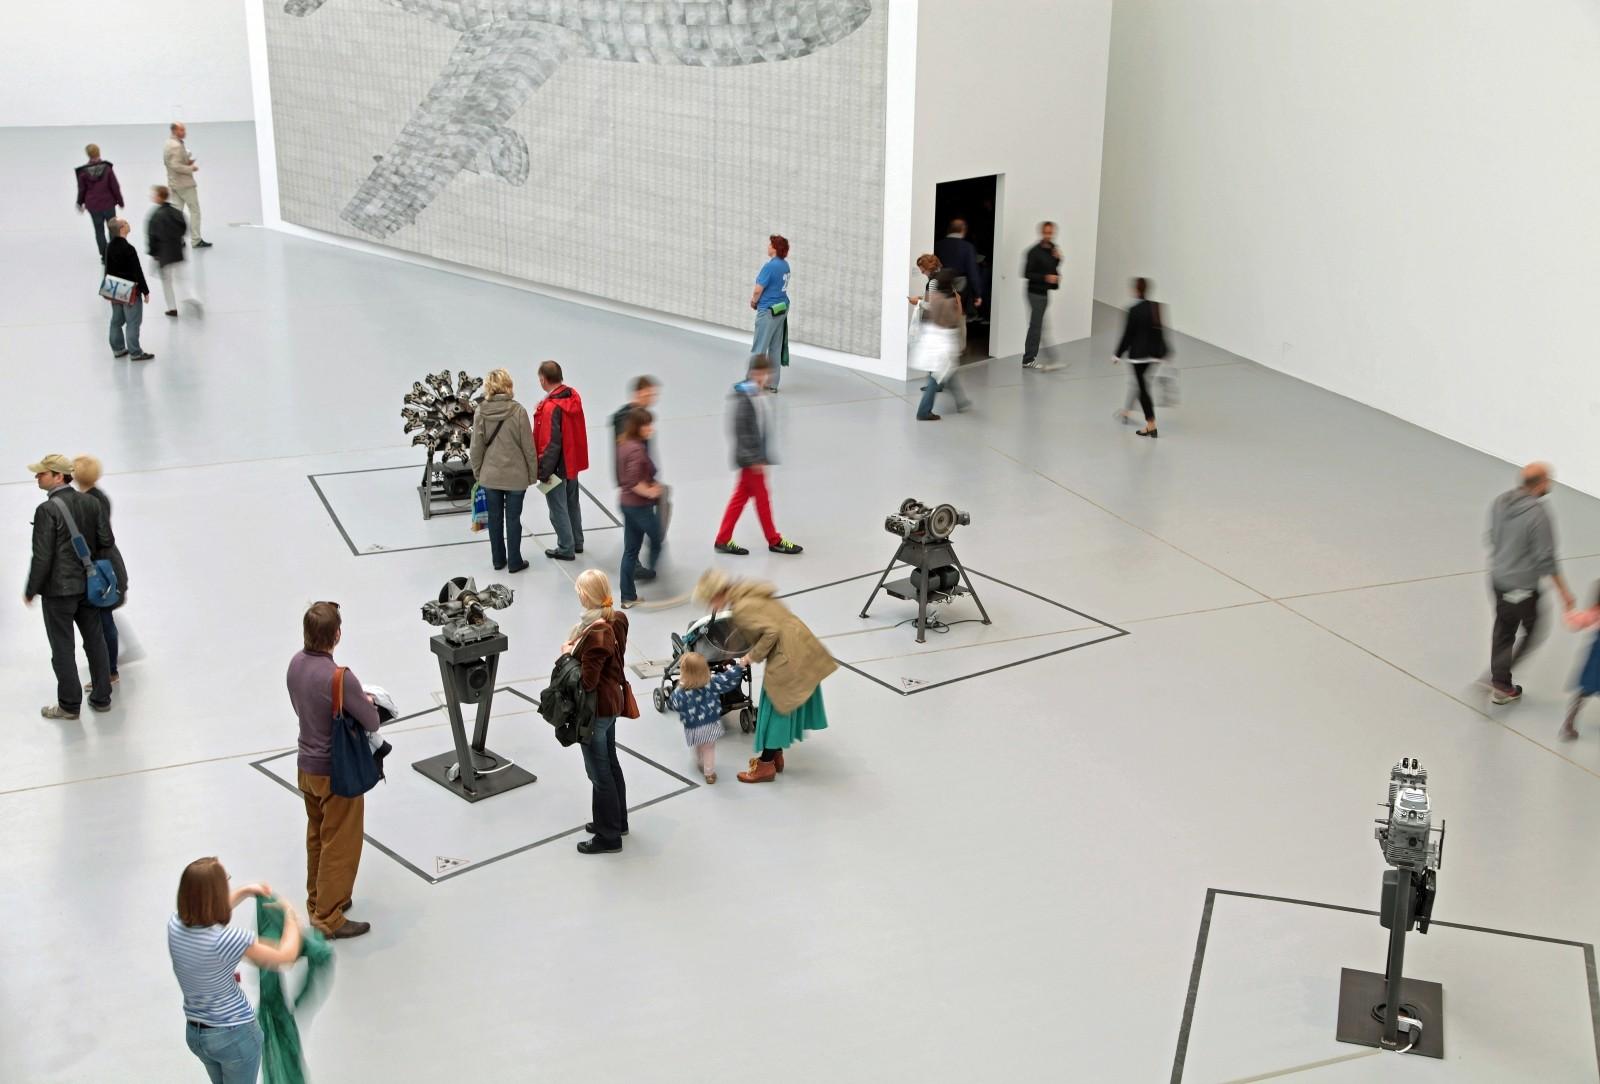 visitatori nei musei